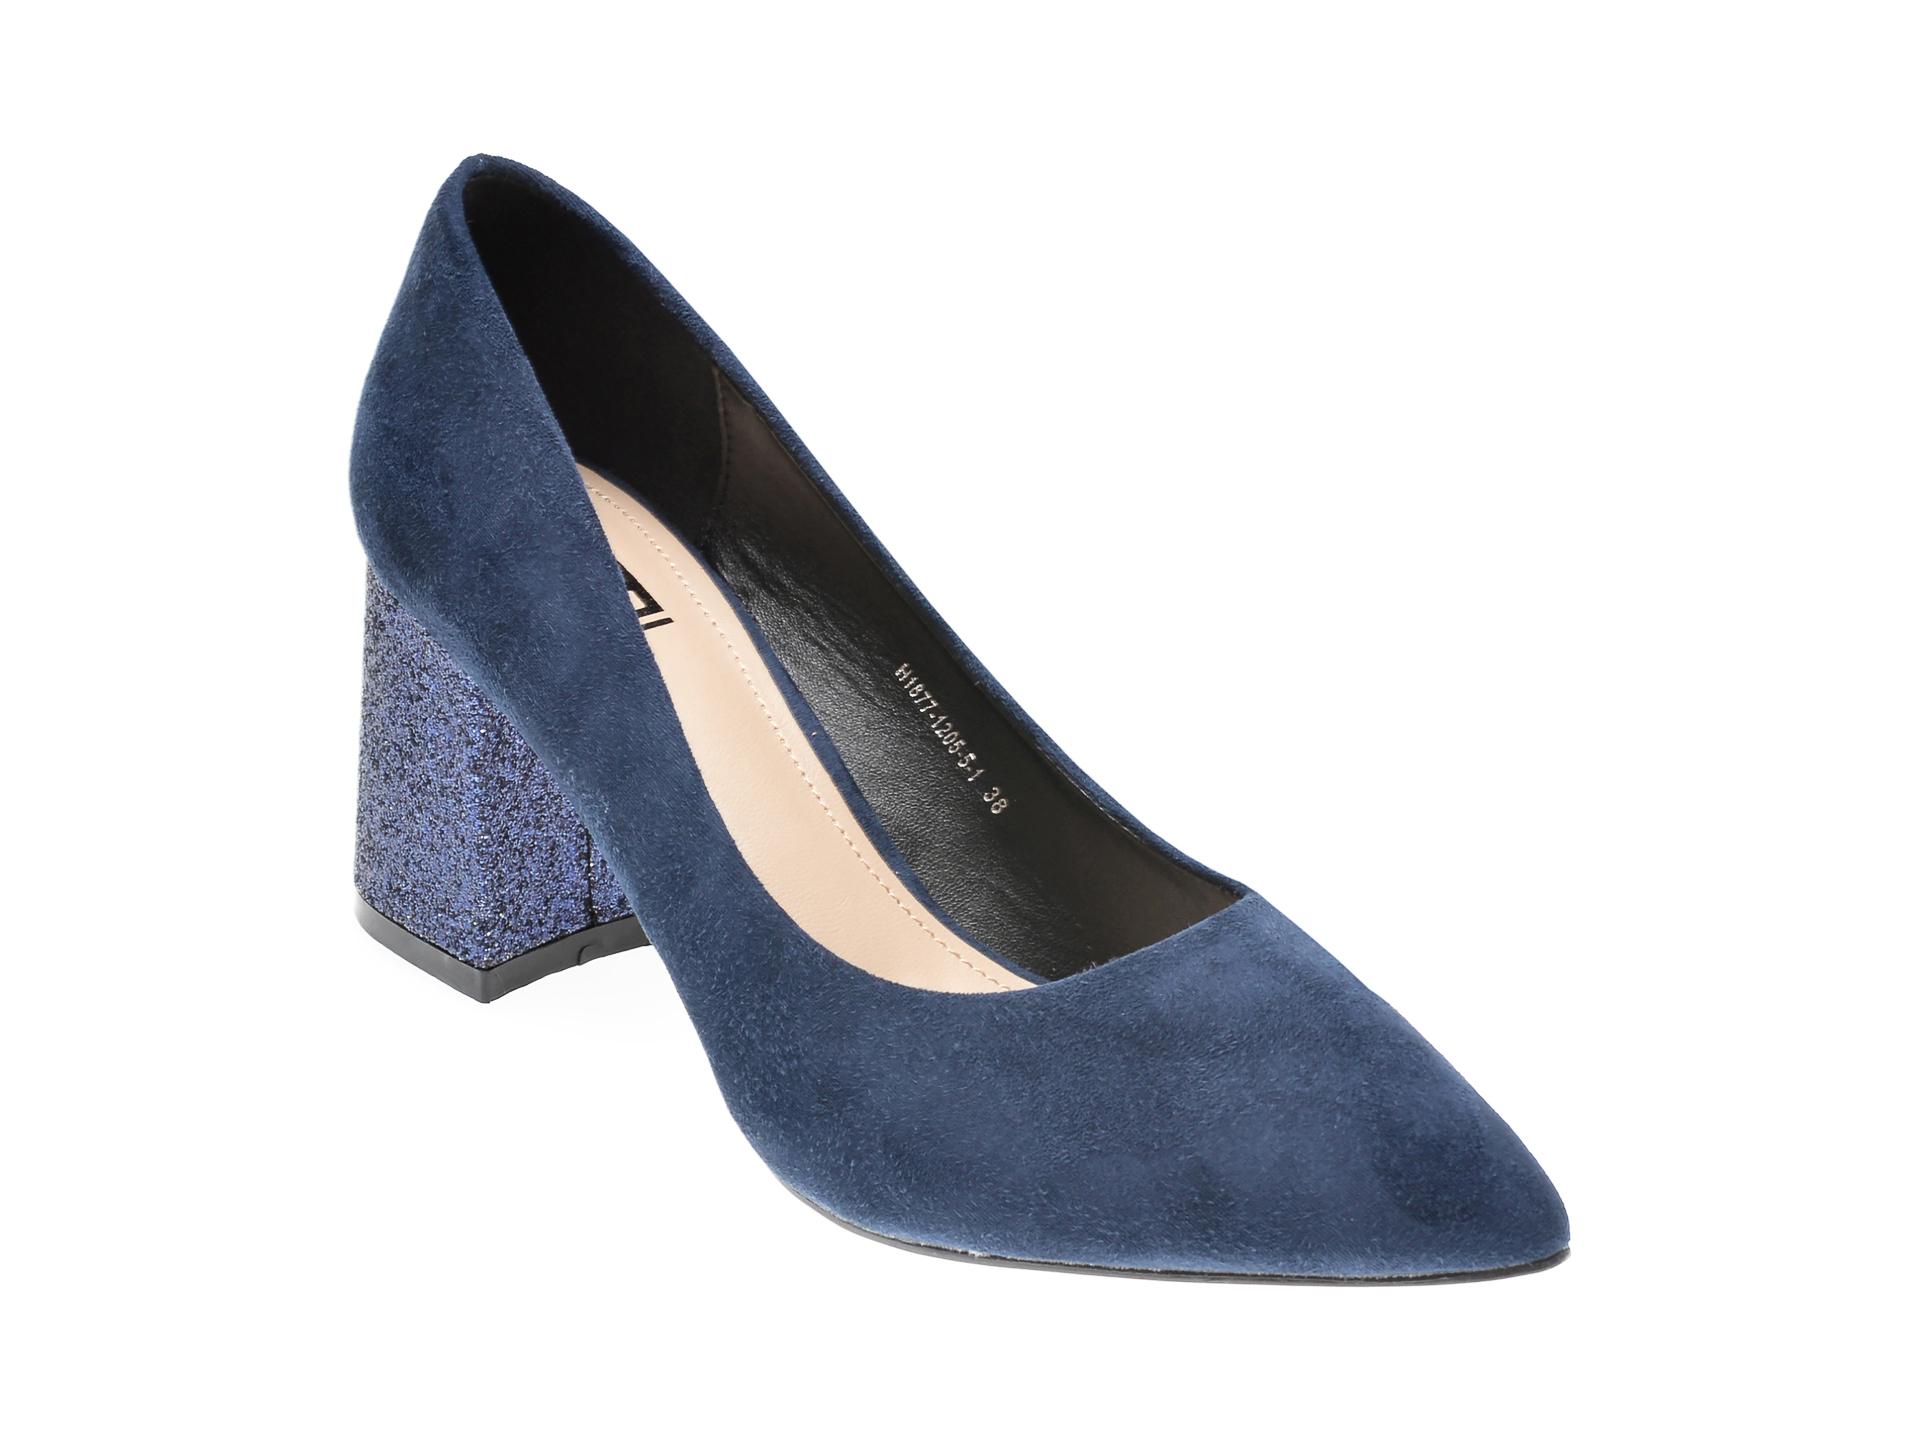 Pantofi RIO FIORE bleumarin, H1877, din piele ecologica imagine